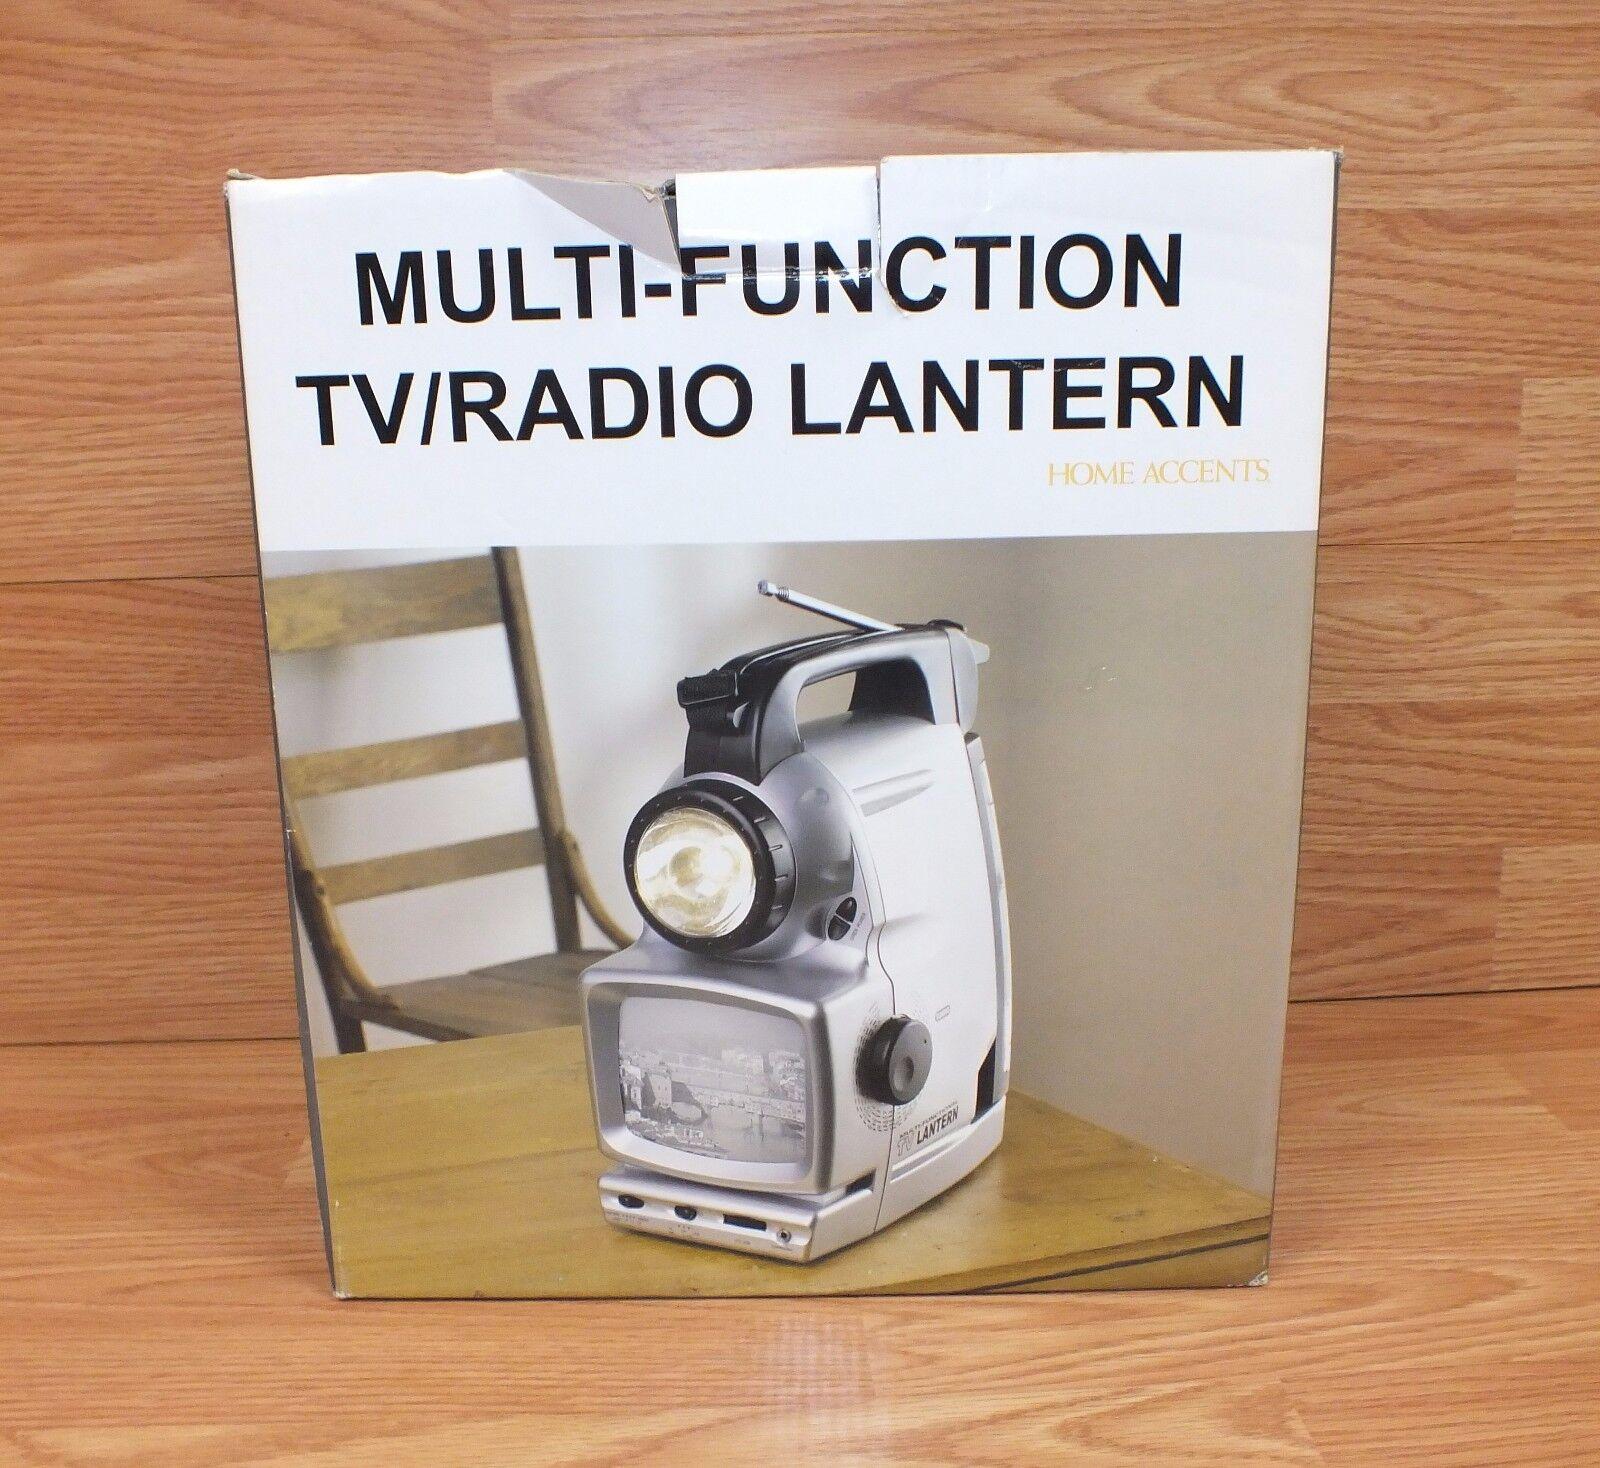 Unbranded (LT631-D) 5 in 1 Multi Functional 5  TV Radio Lantern w  Siren & Flash